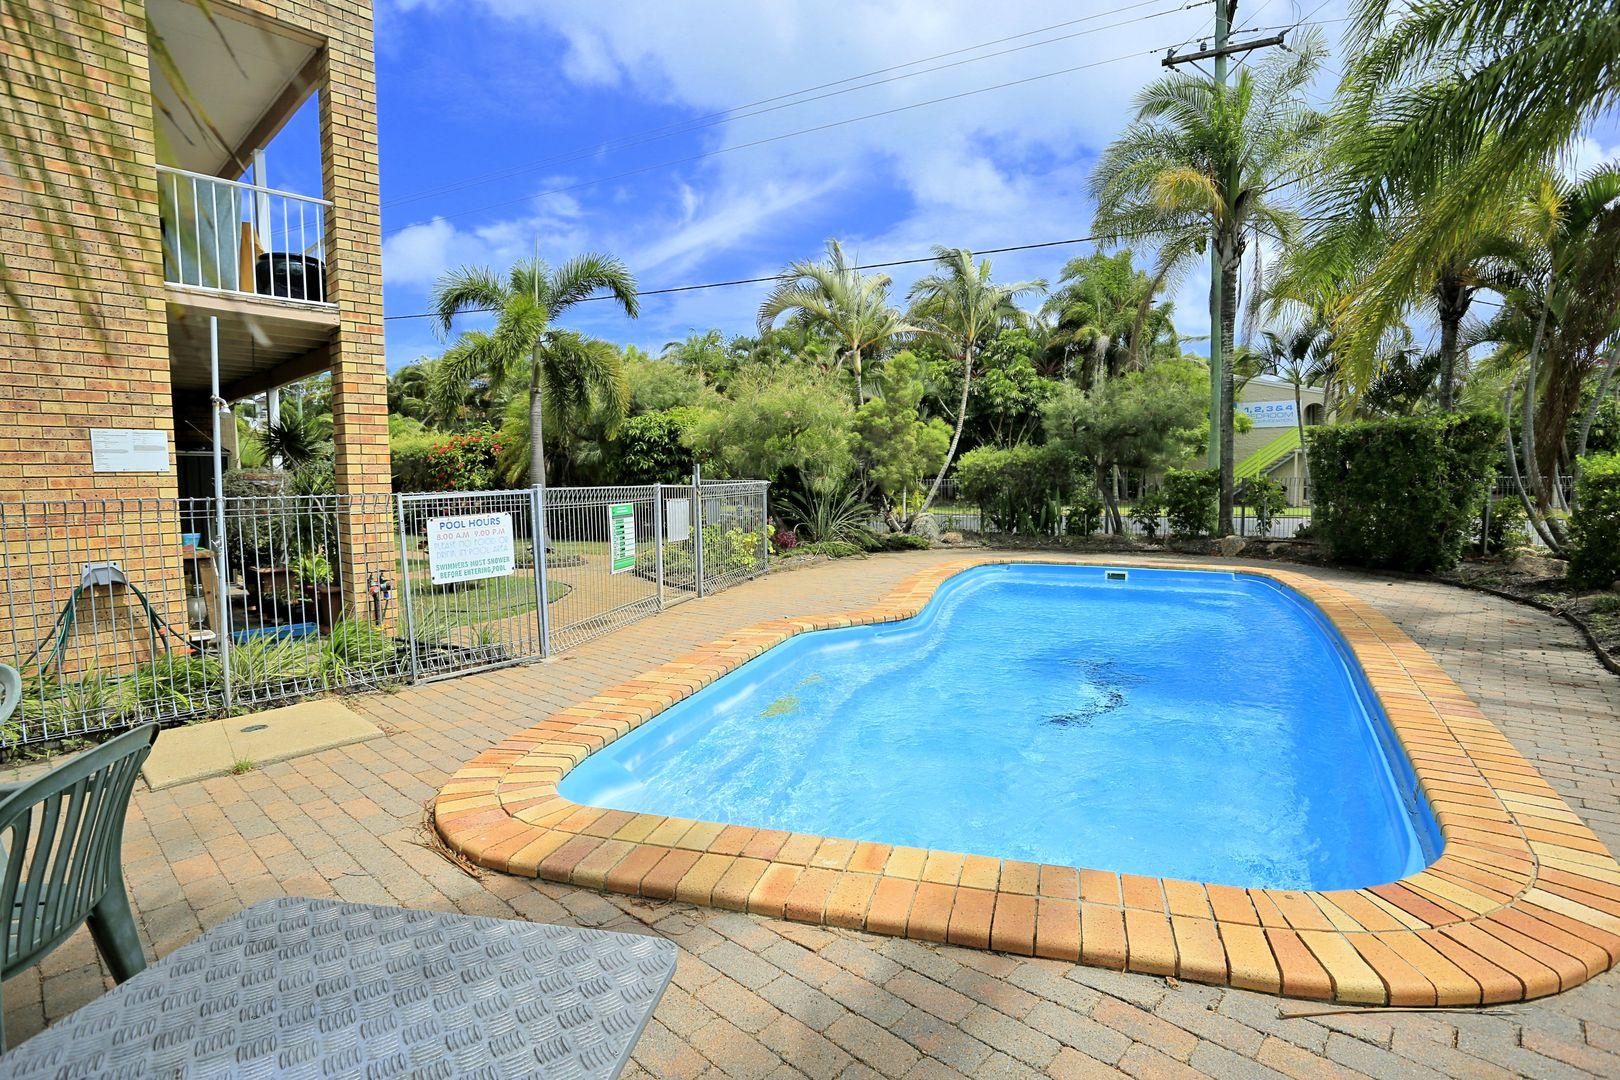 3/99 Cypress Street, Torquay QLD 4655, Image 0